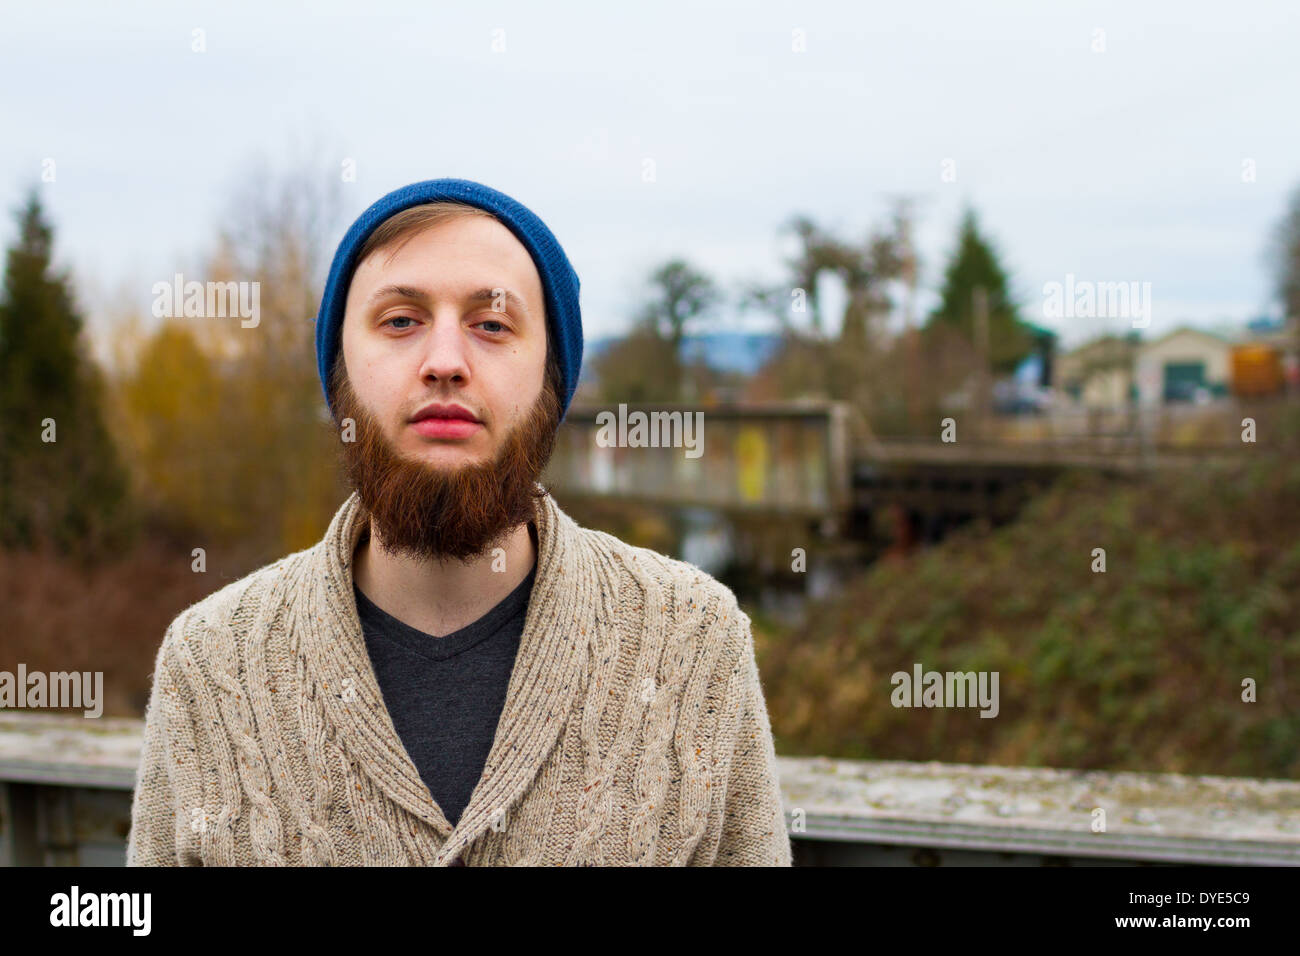 Hipster-Kerl, der moderne Herrenmode in diesem trendigen Porträt zeigt. Stockfoto